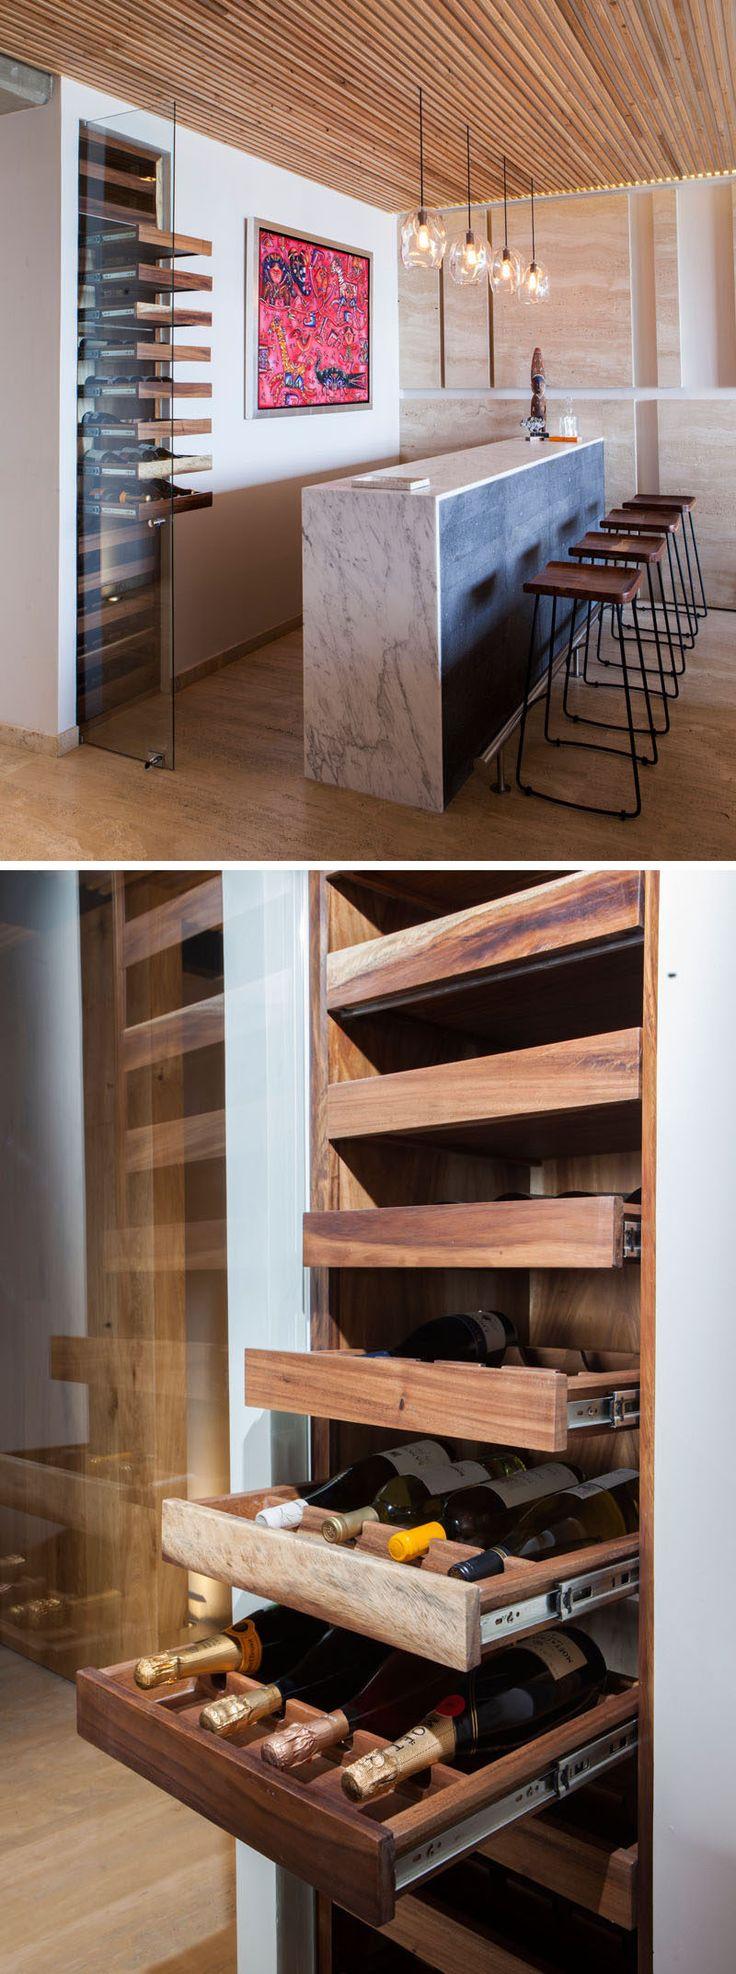 best  modern wine rack ideas on pinterest  wine rack  - an elegant apartment with a wood slat ceiling cool wine rackswine